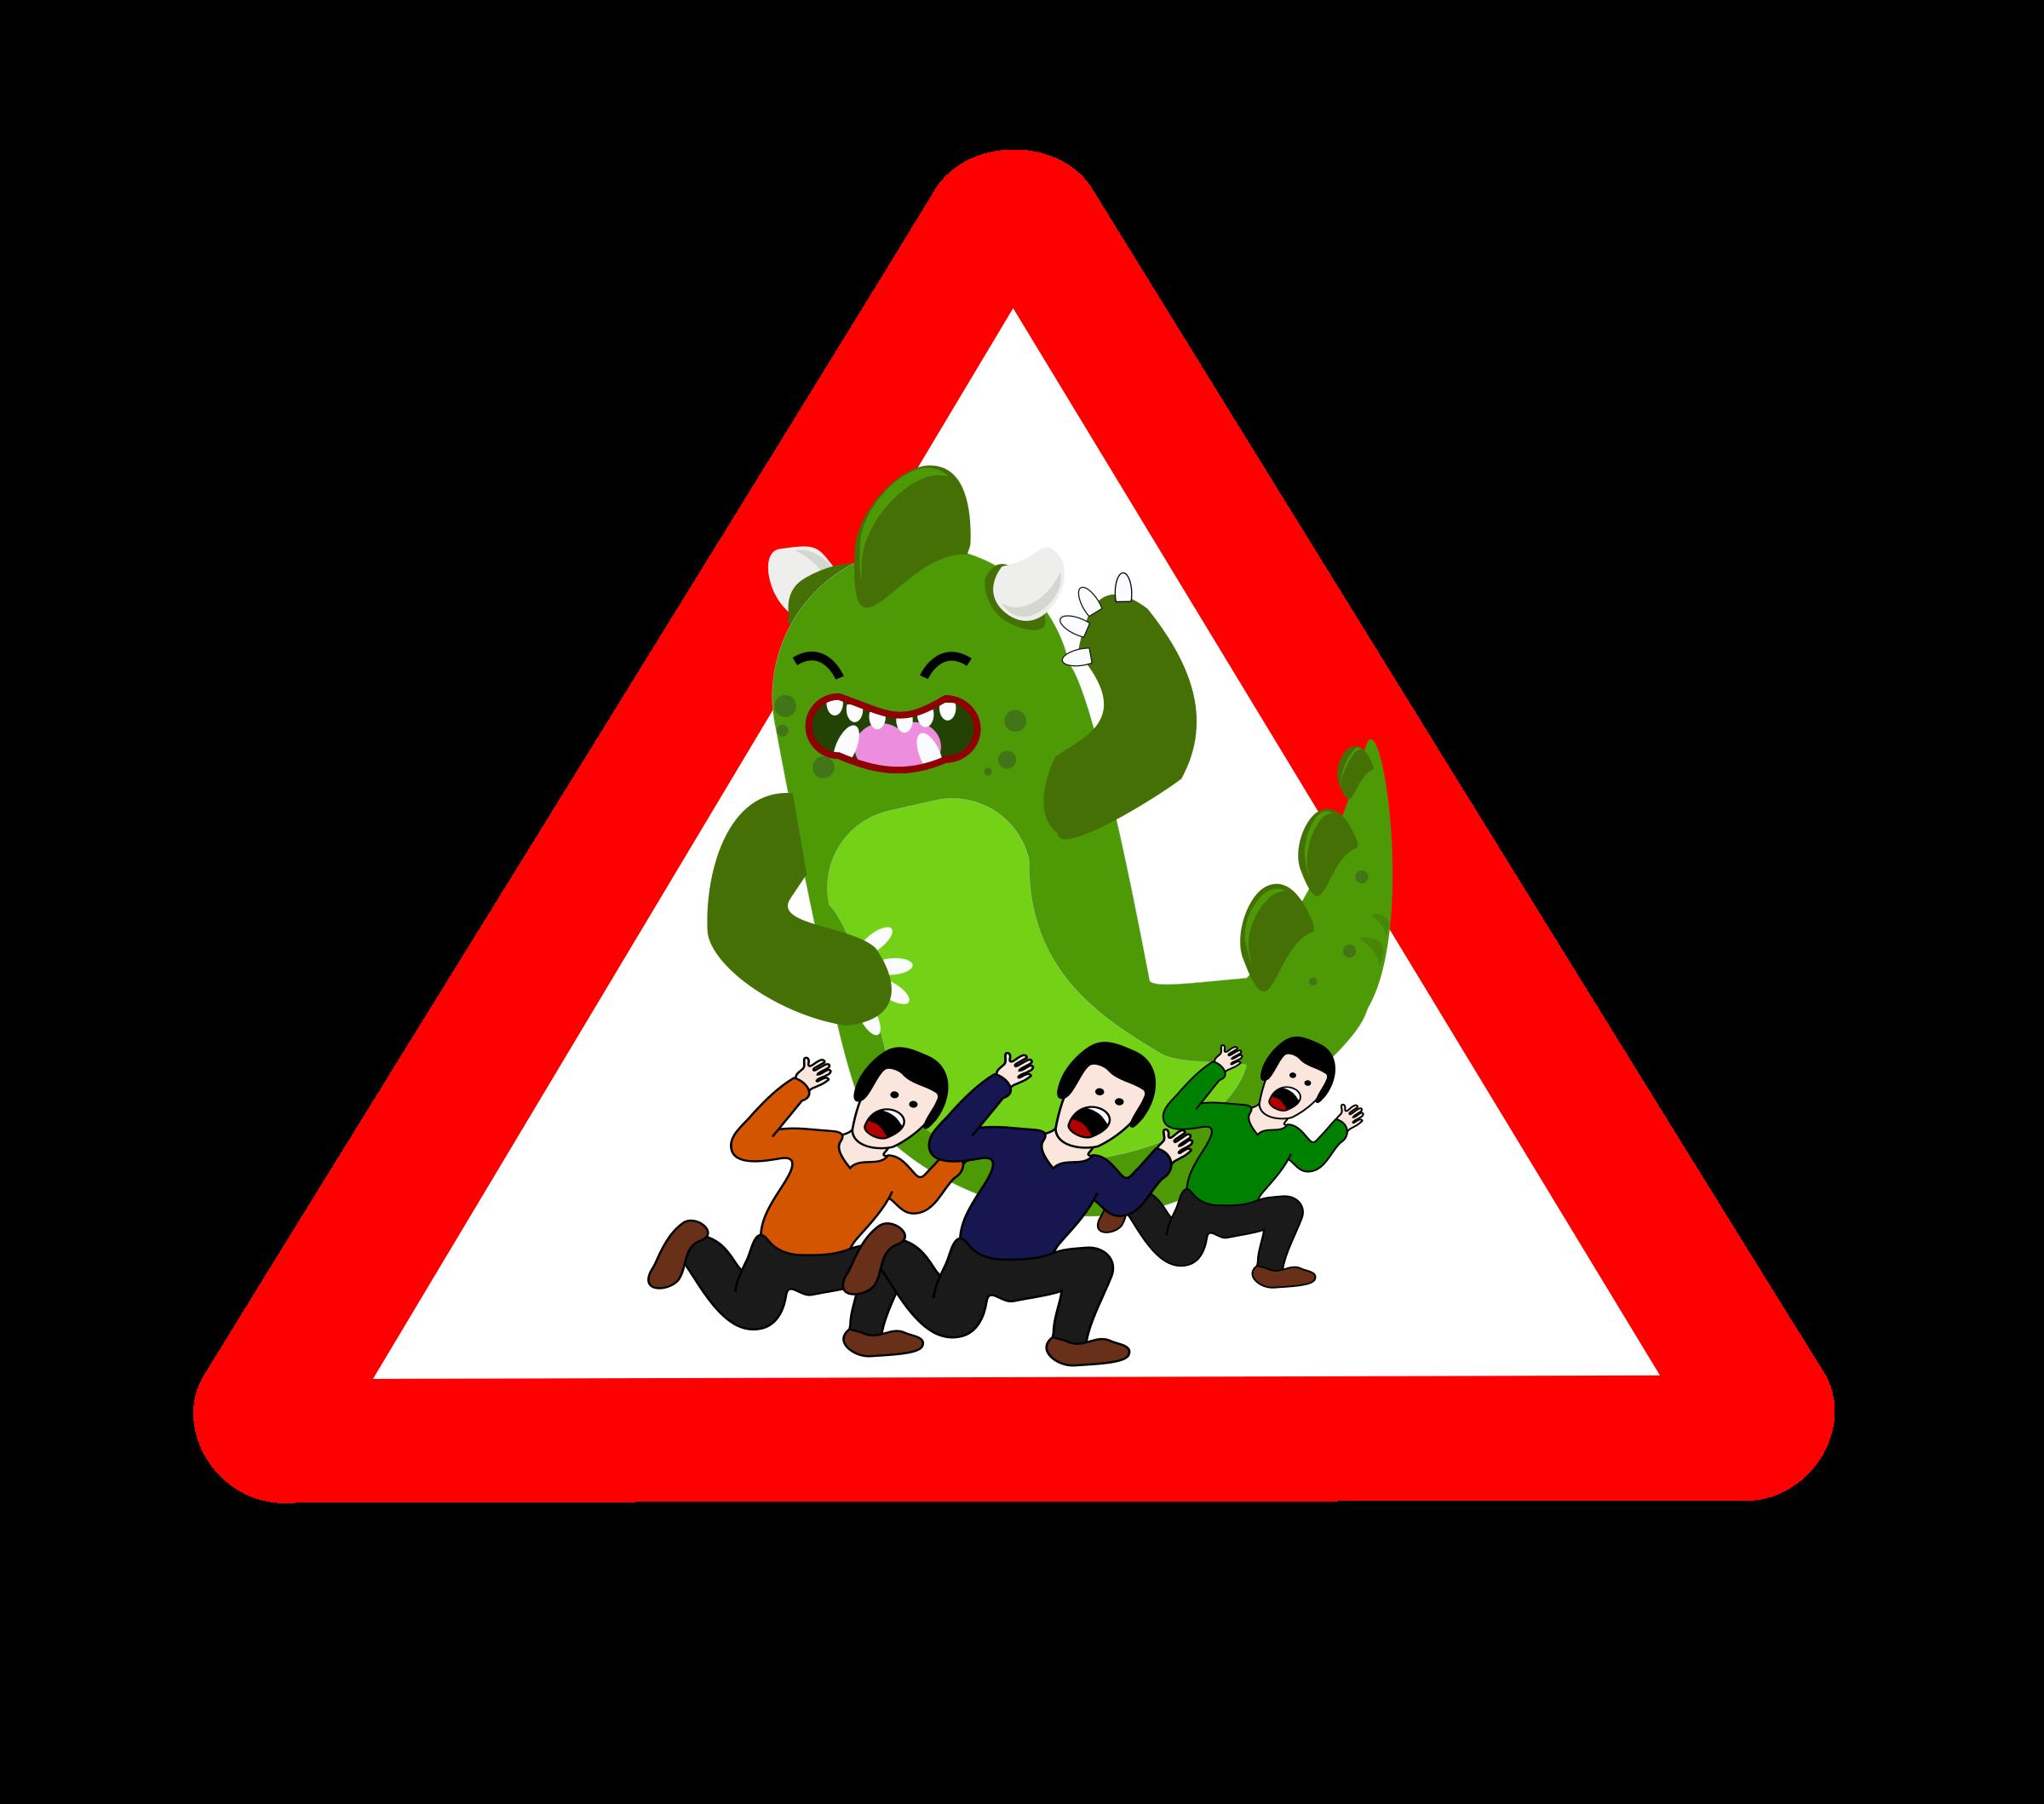 godzilla danger